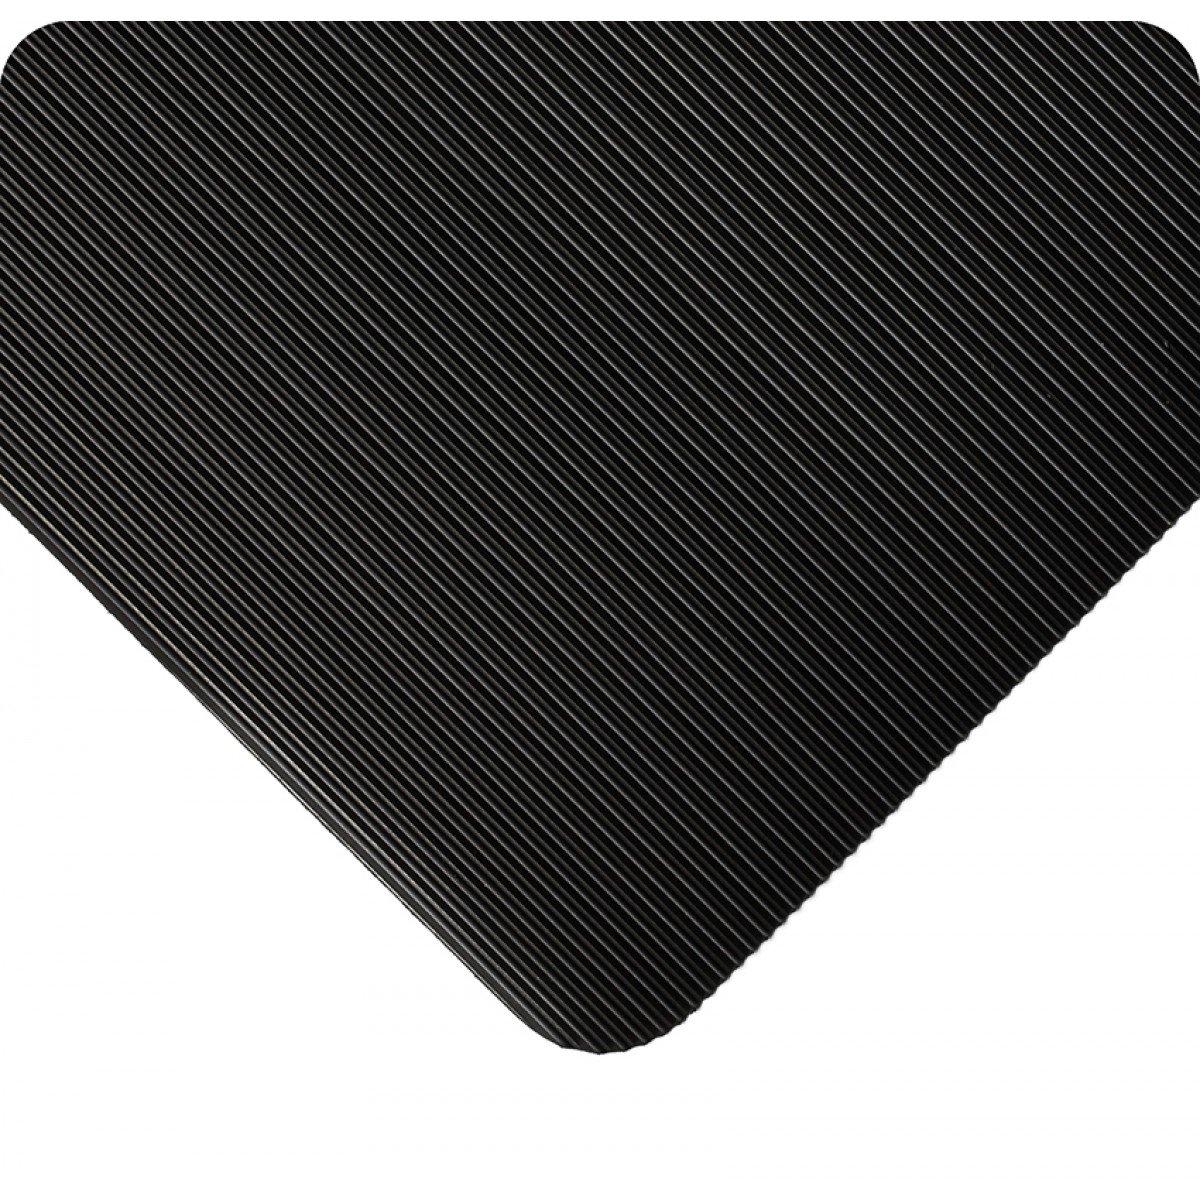 Wearwell 381.18x3x10BK Standard Corrugated Vinyl 10' Mat Runner Max Award-winning store 77% OFF